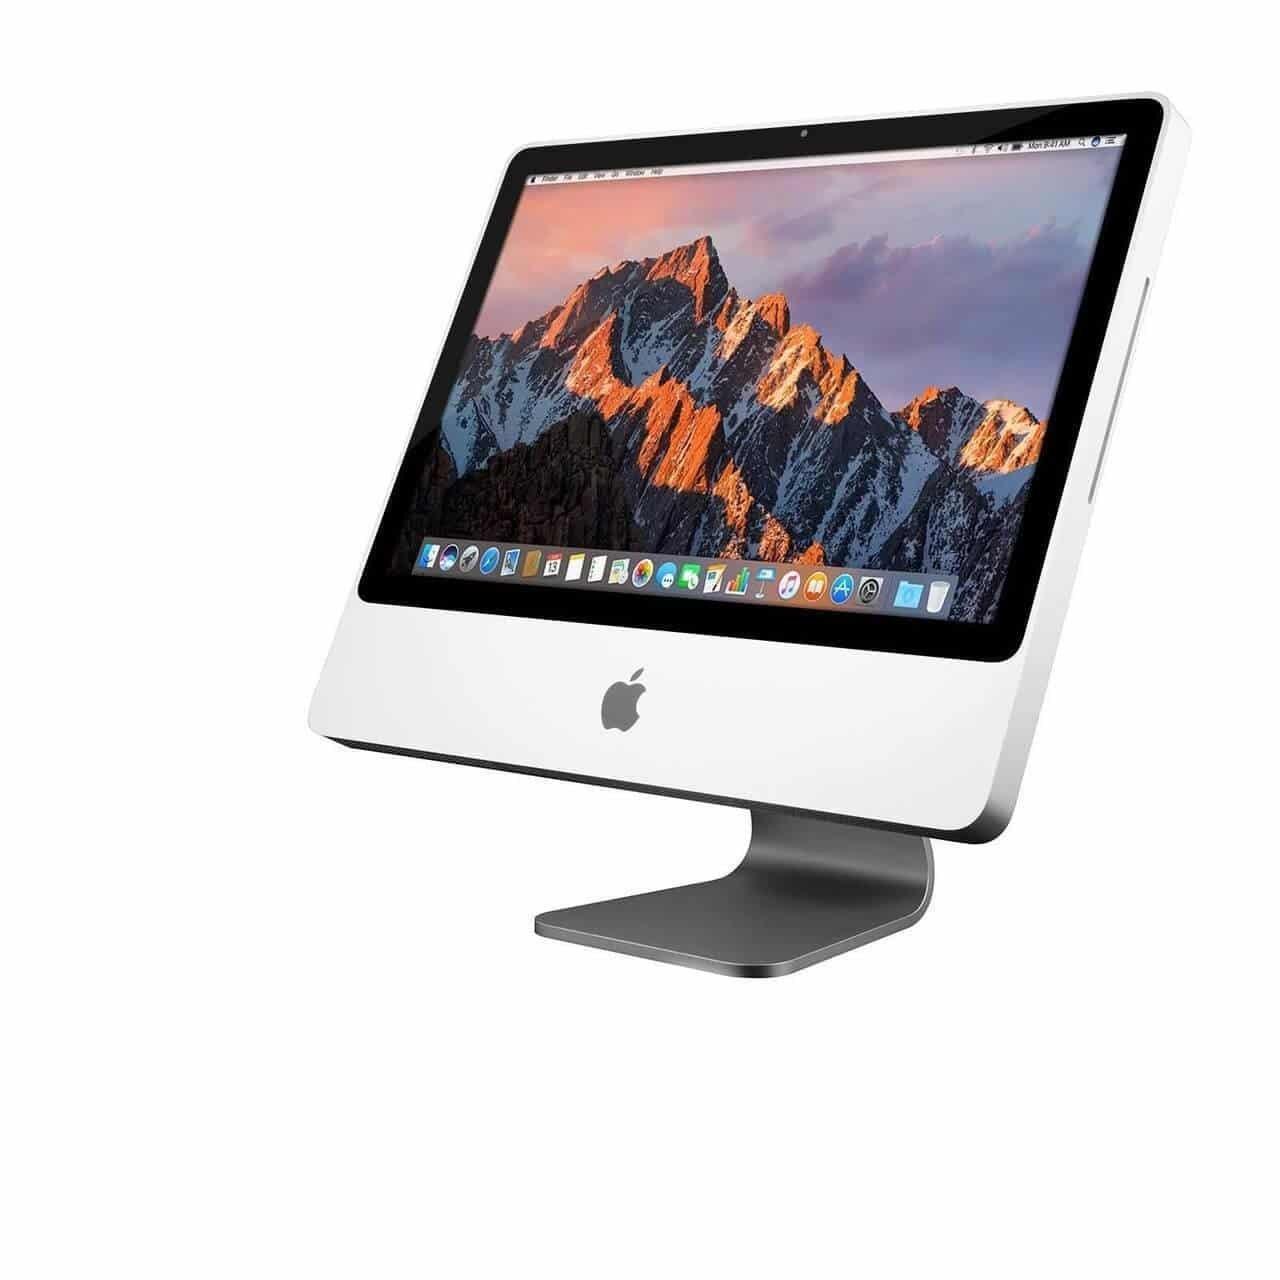 iMac (2008)